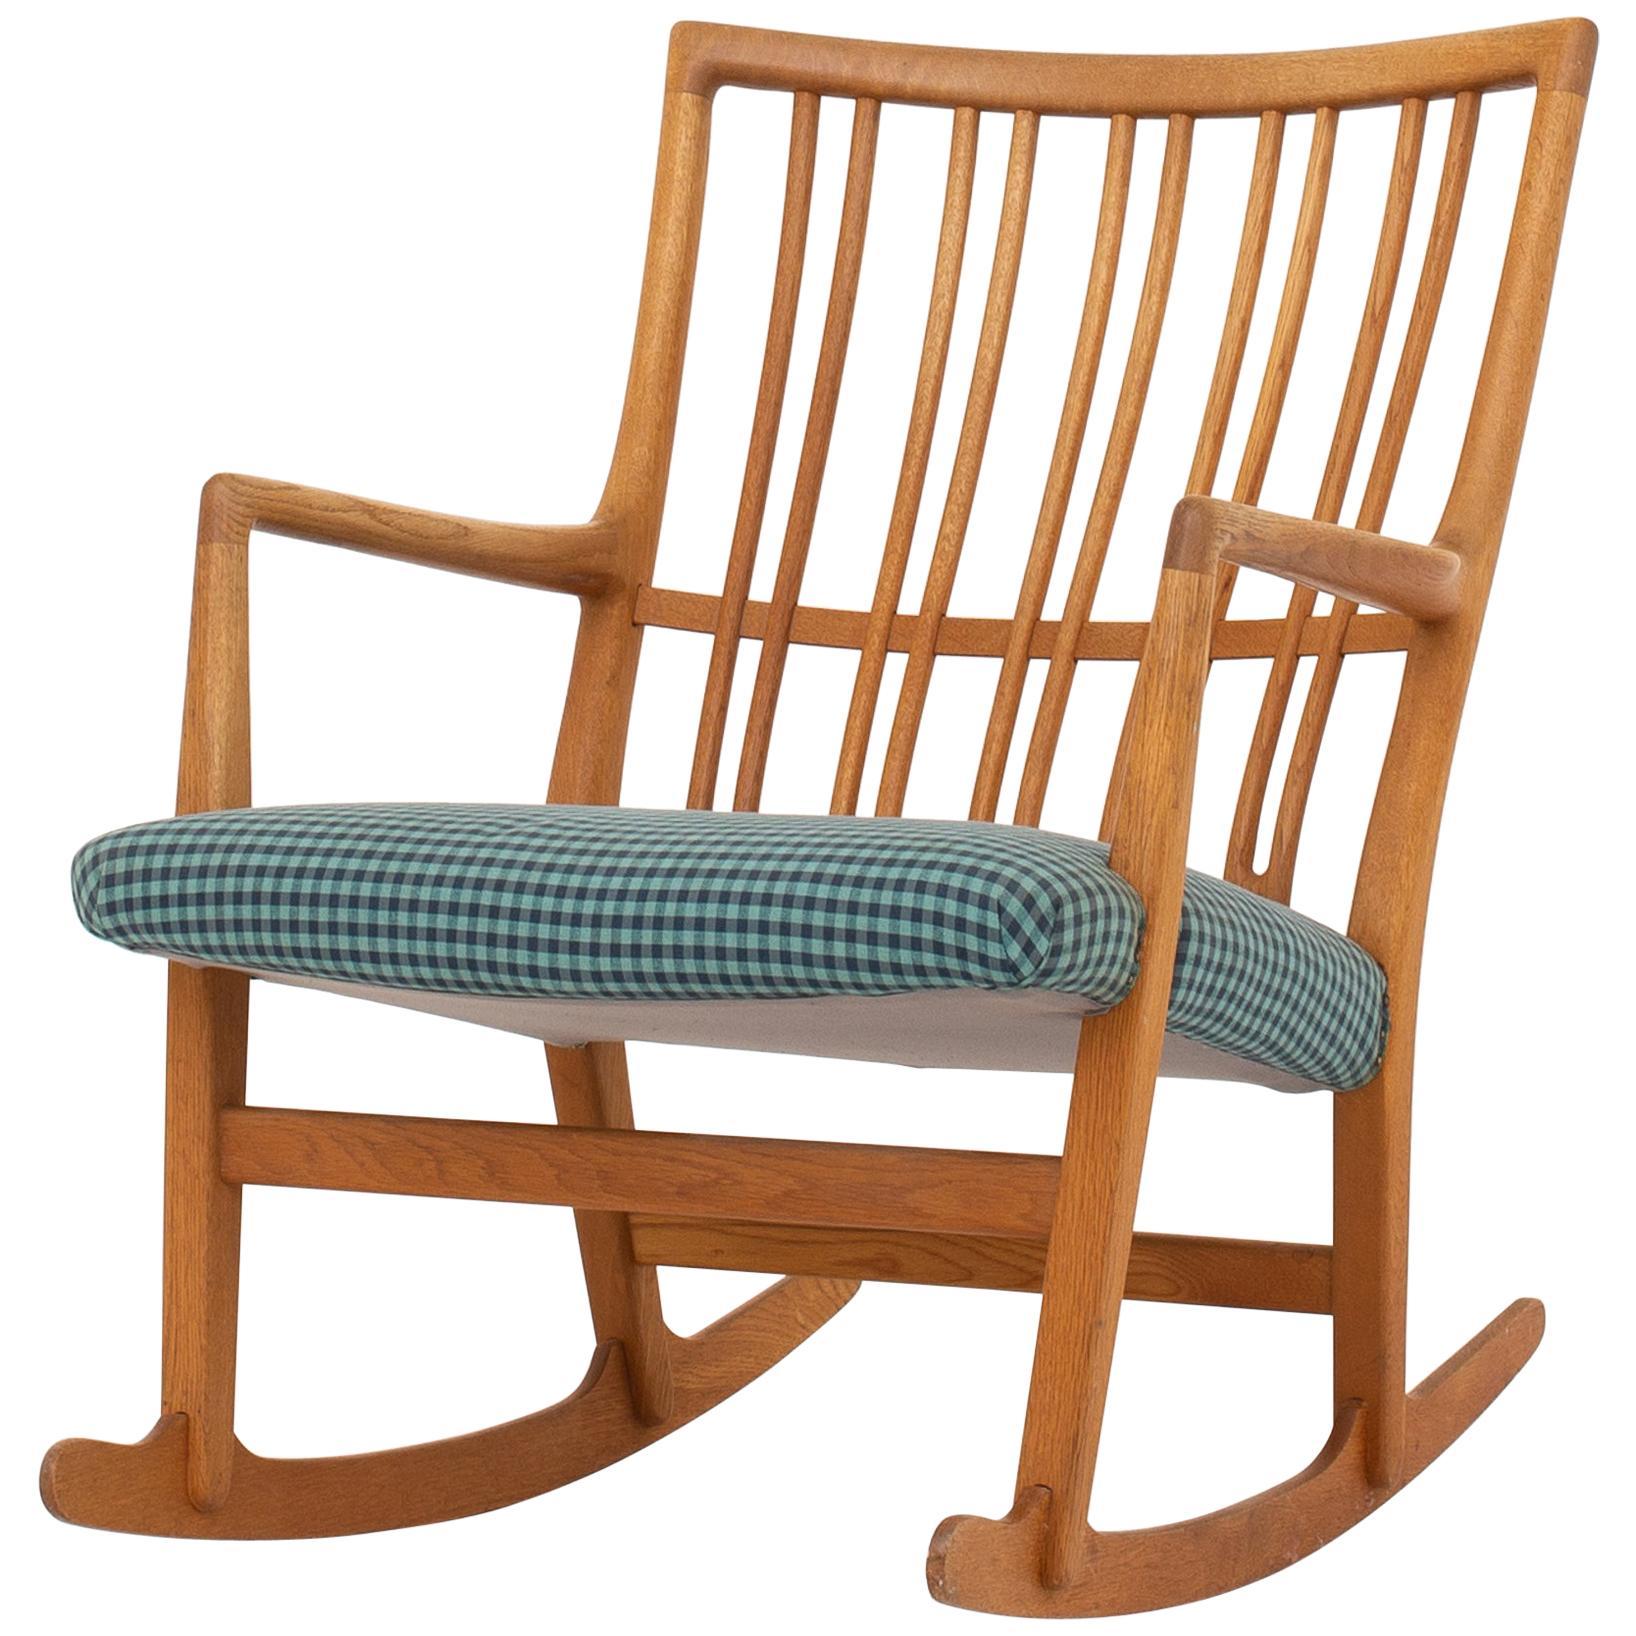 Rocking Chair by Hans J. Wegner